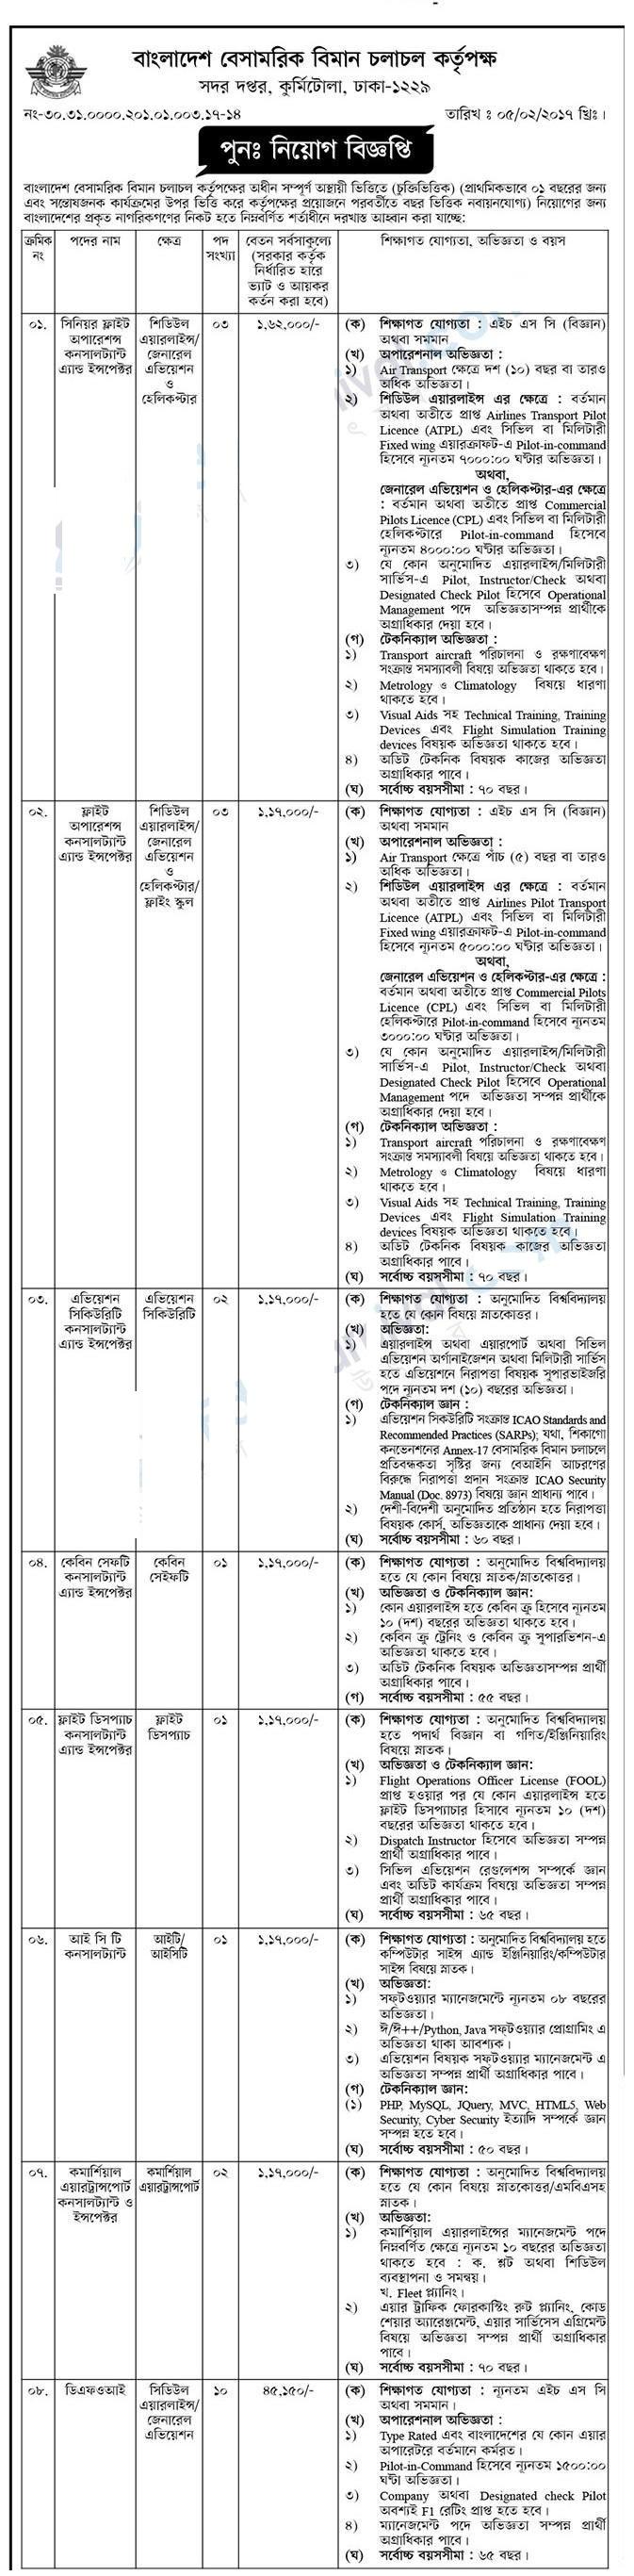 Civil Aviation Authority, Bangladesh Job Circular 2017